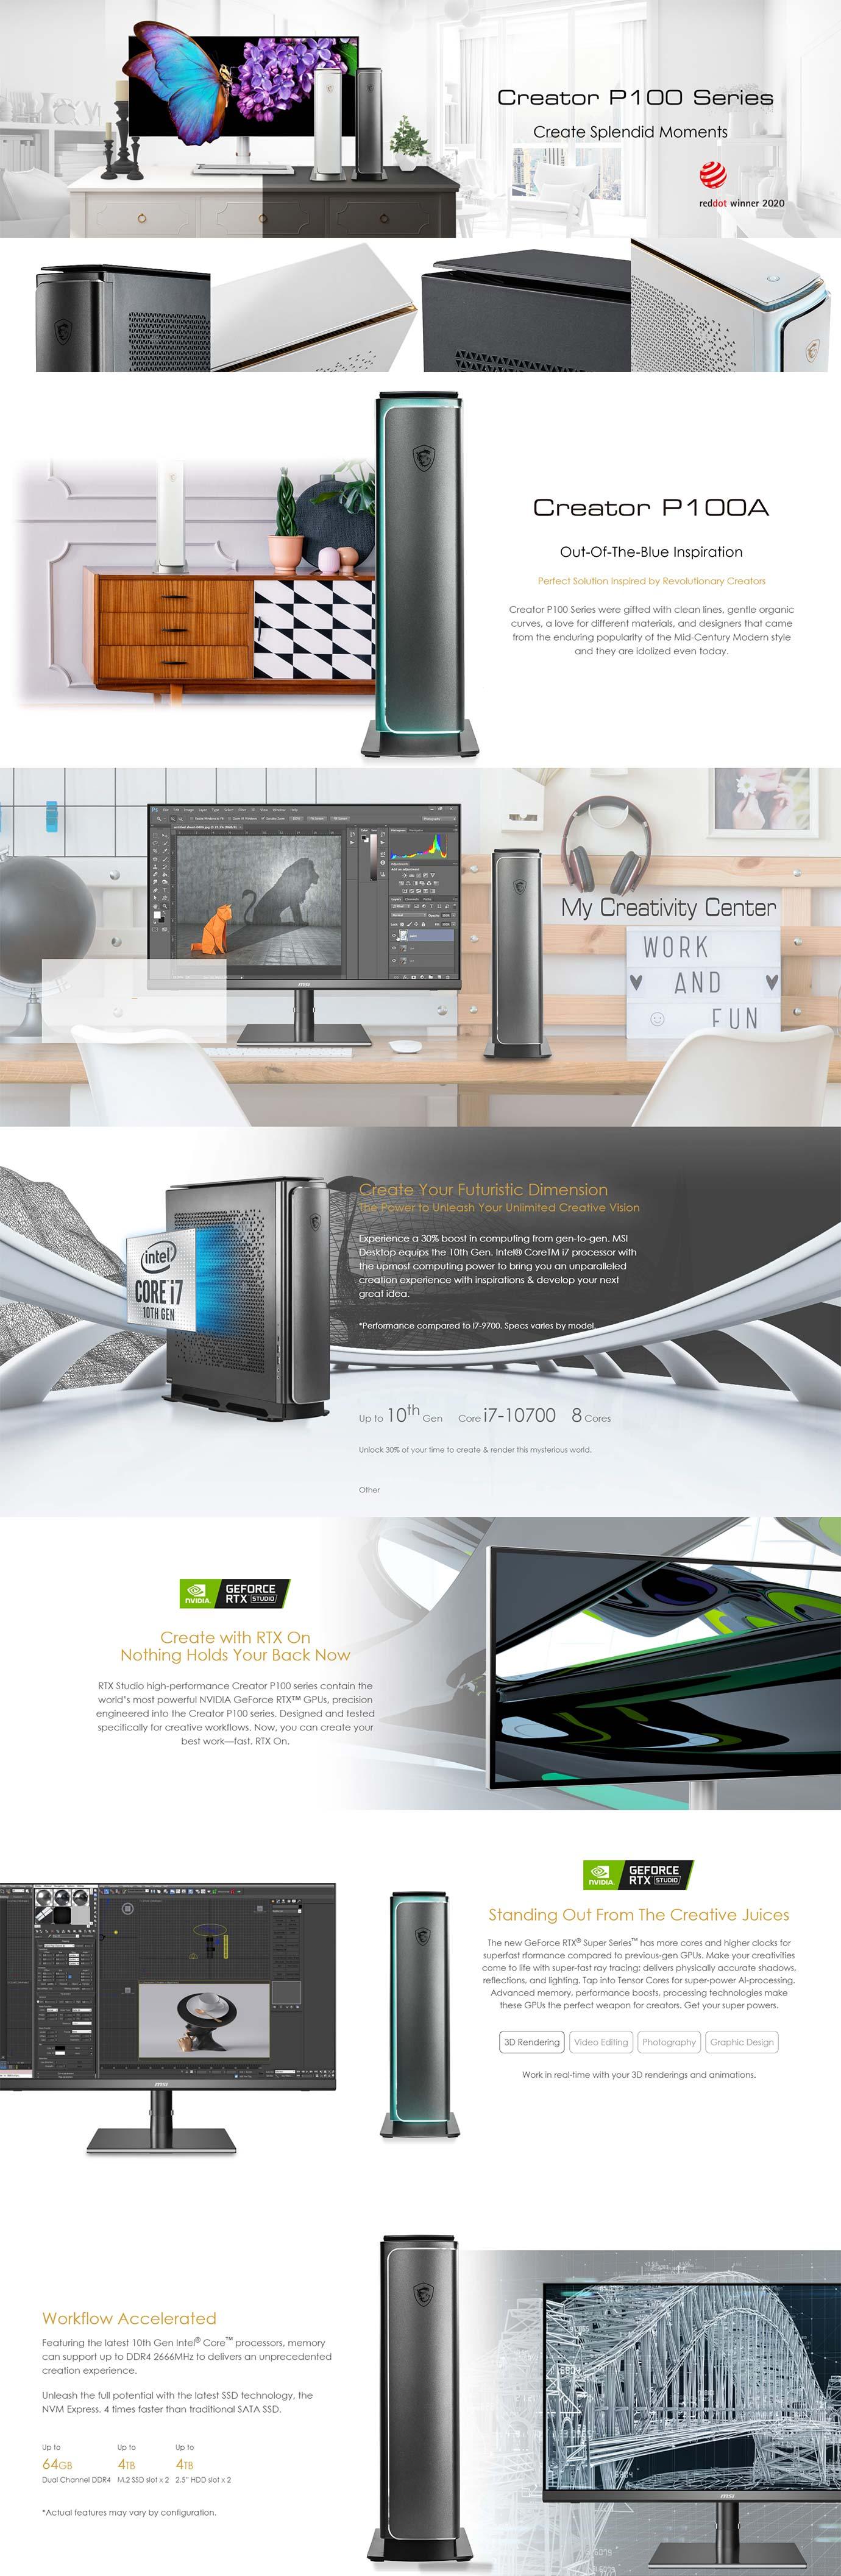 MSI Creator P100A 10T Desktop